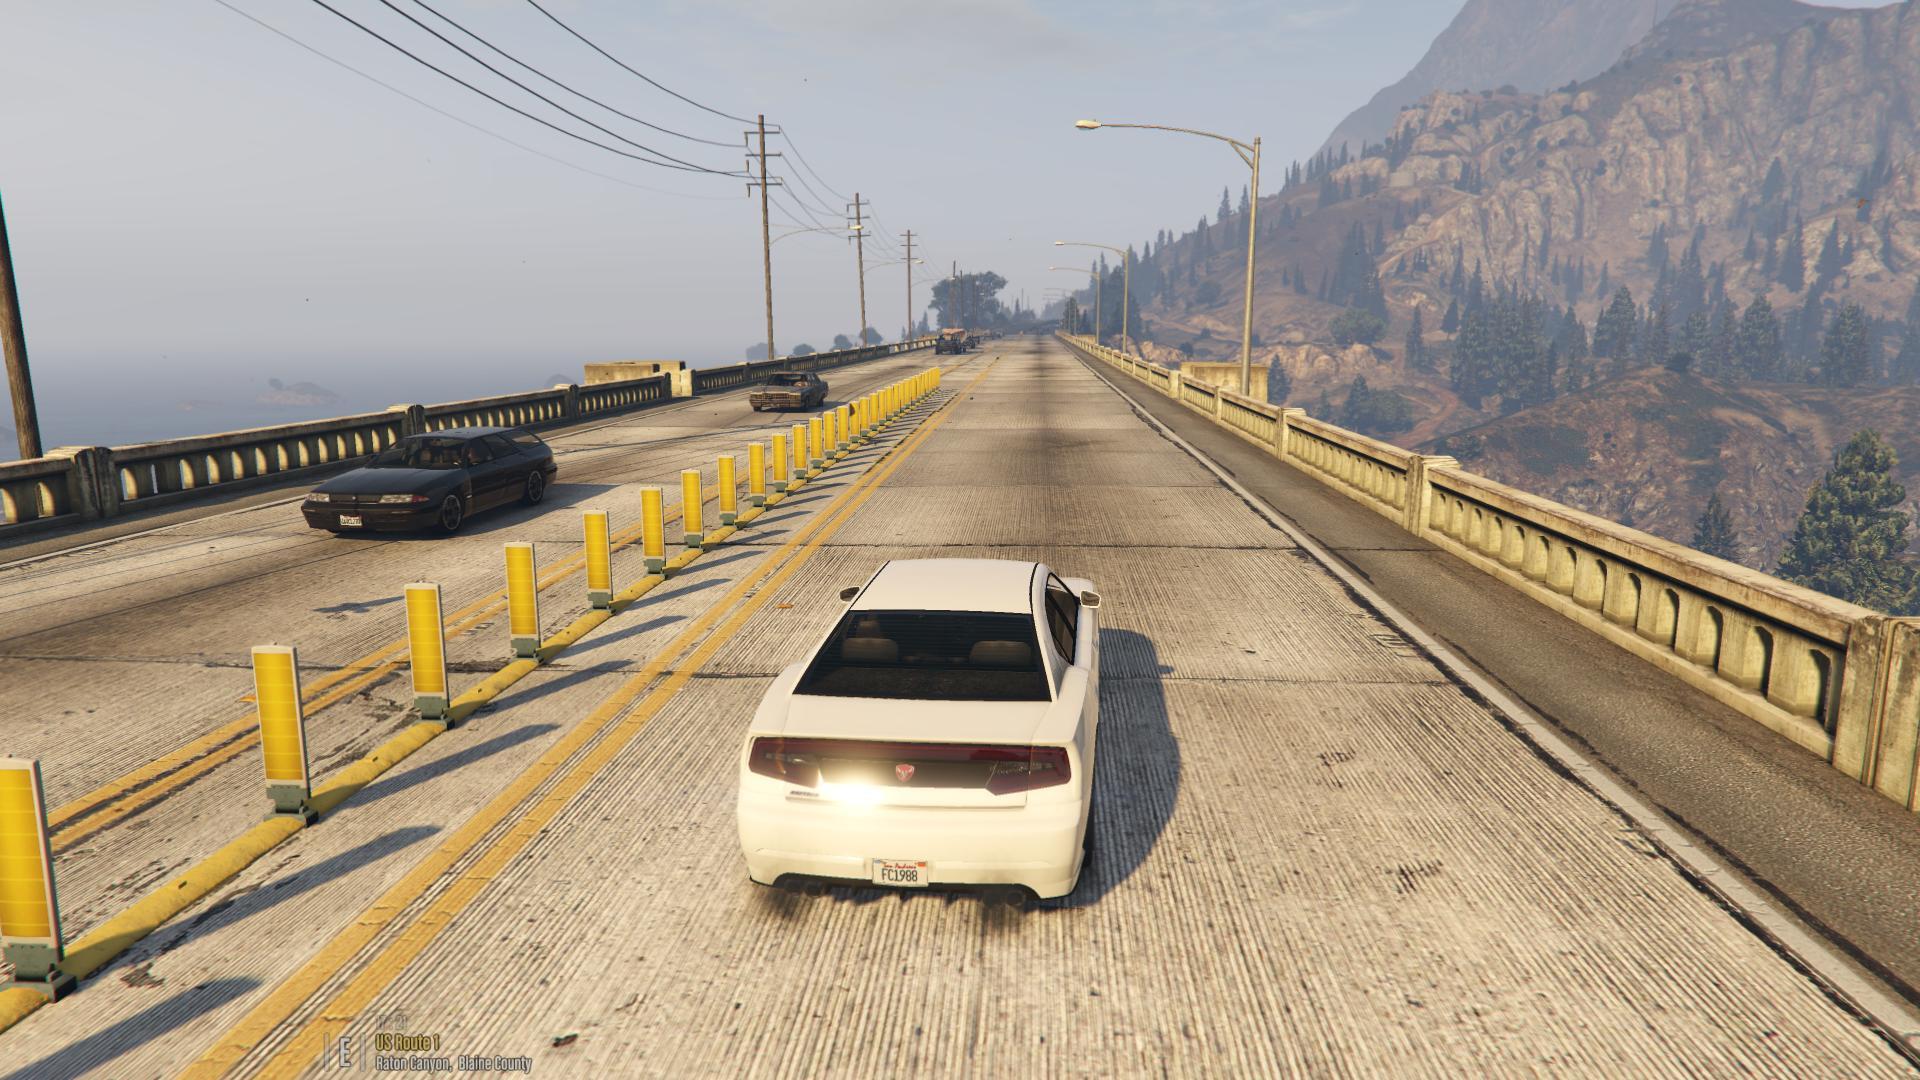 Grand theft auto mods 5